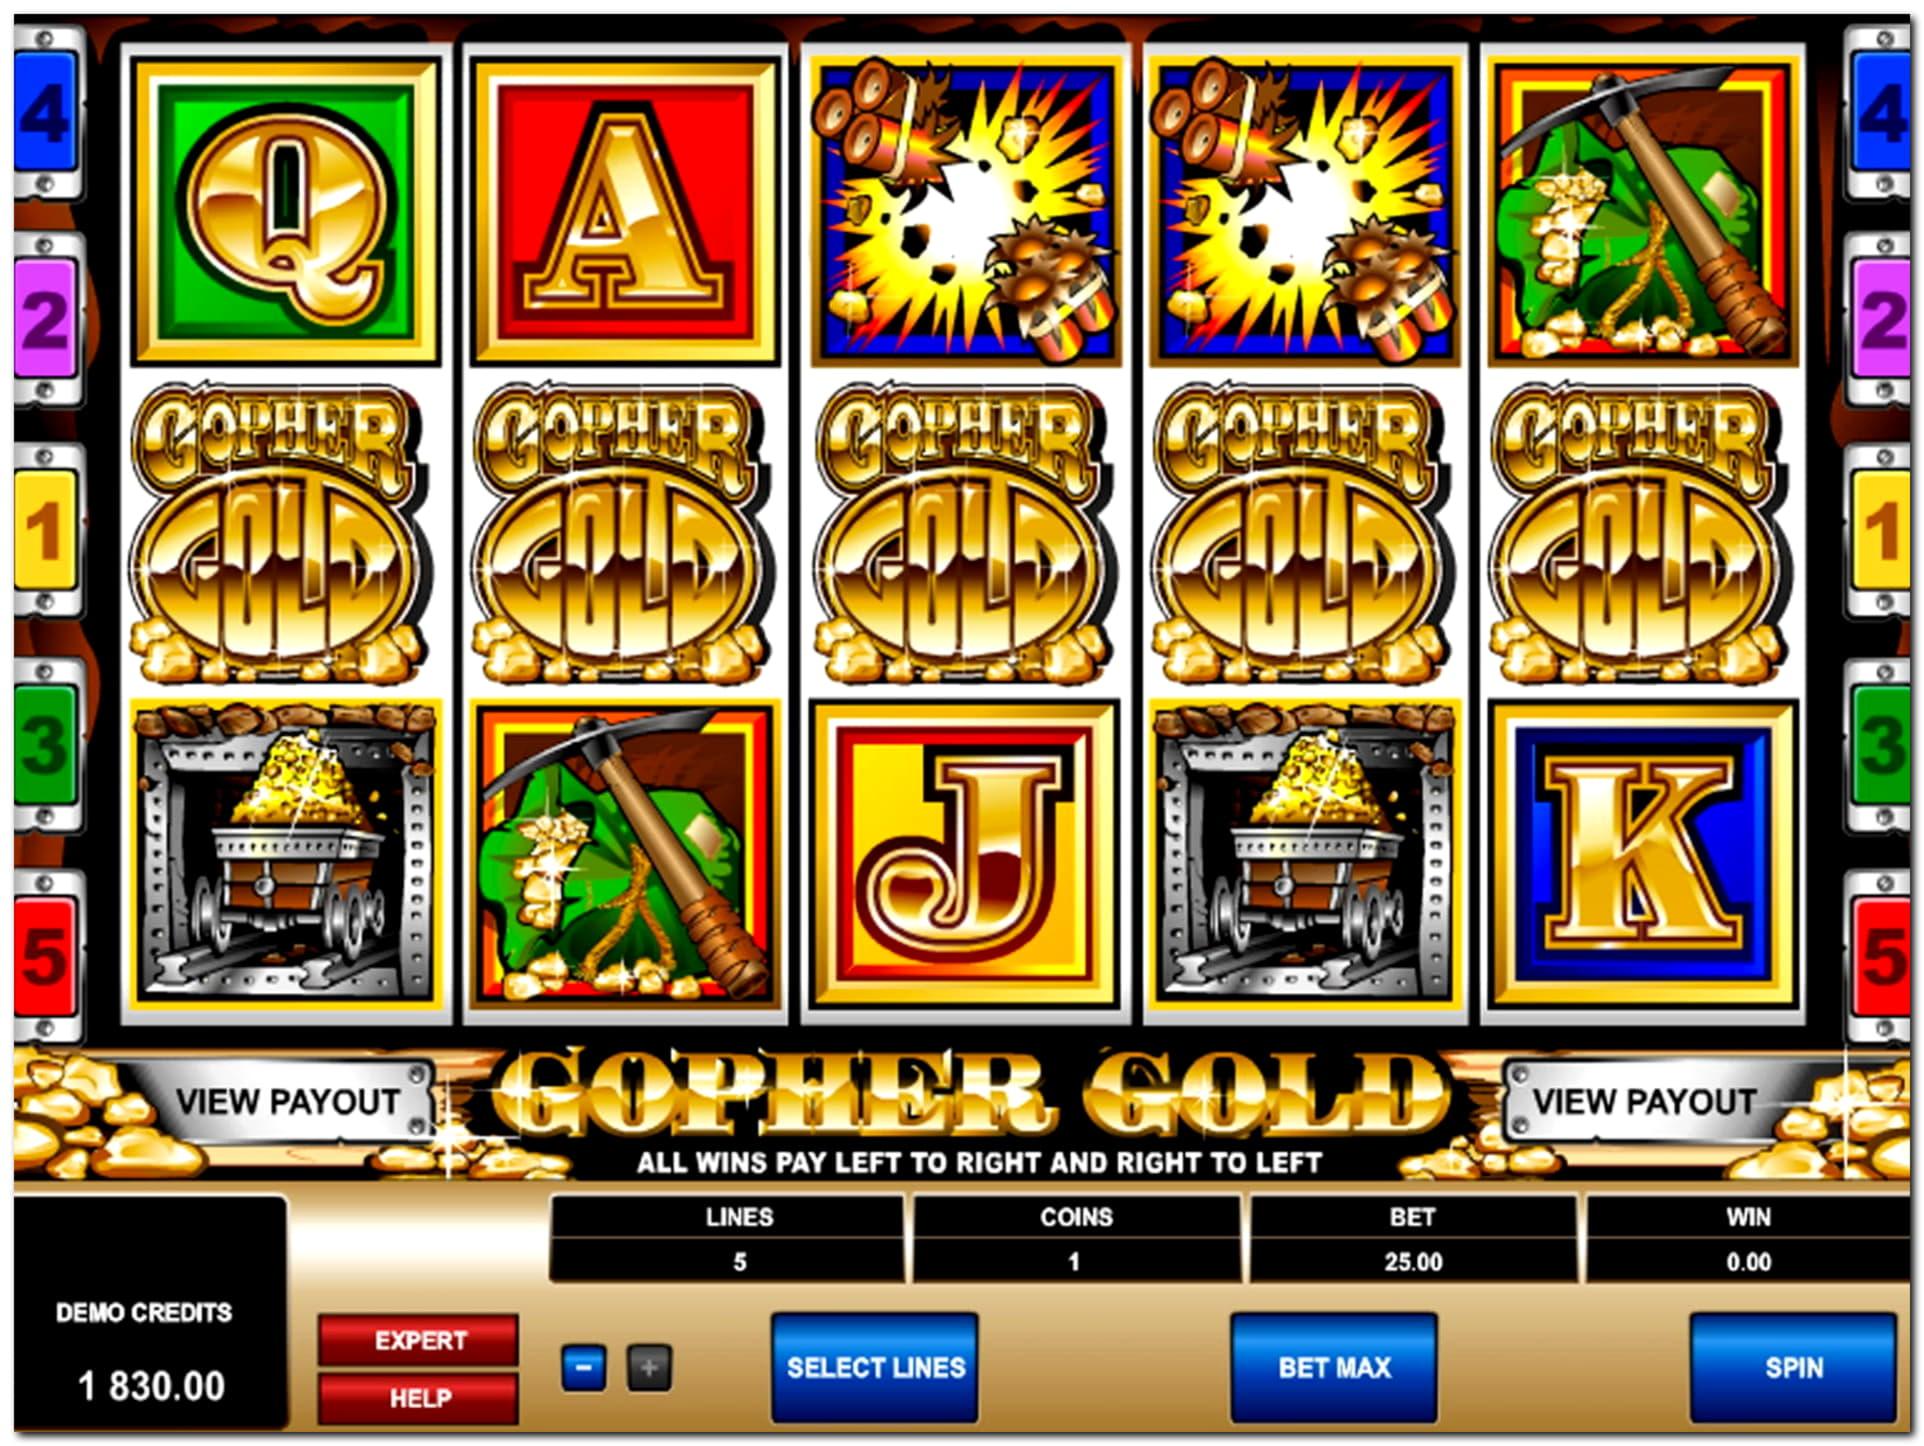 565 Reels Casinoの€7カジノチップ